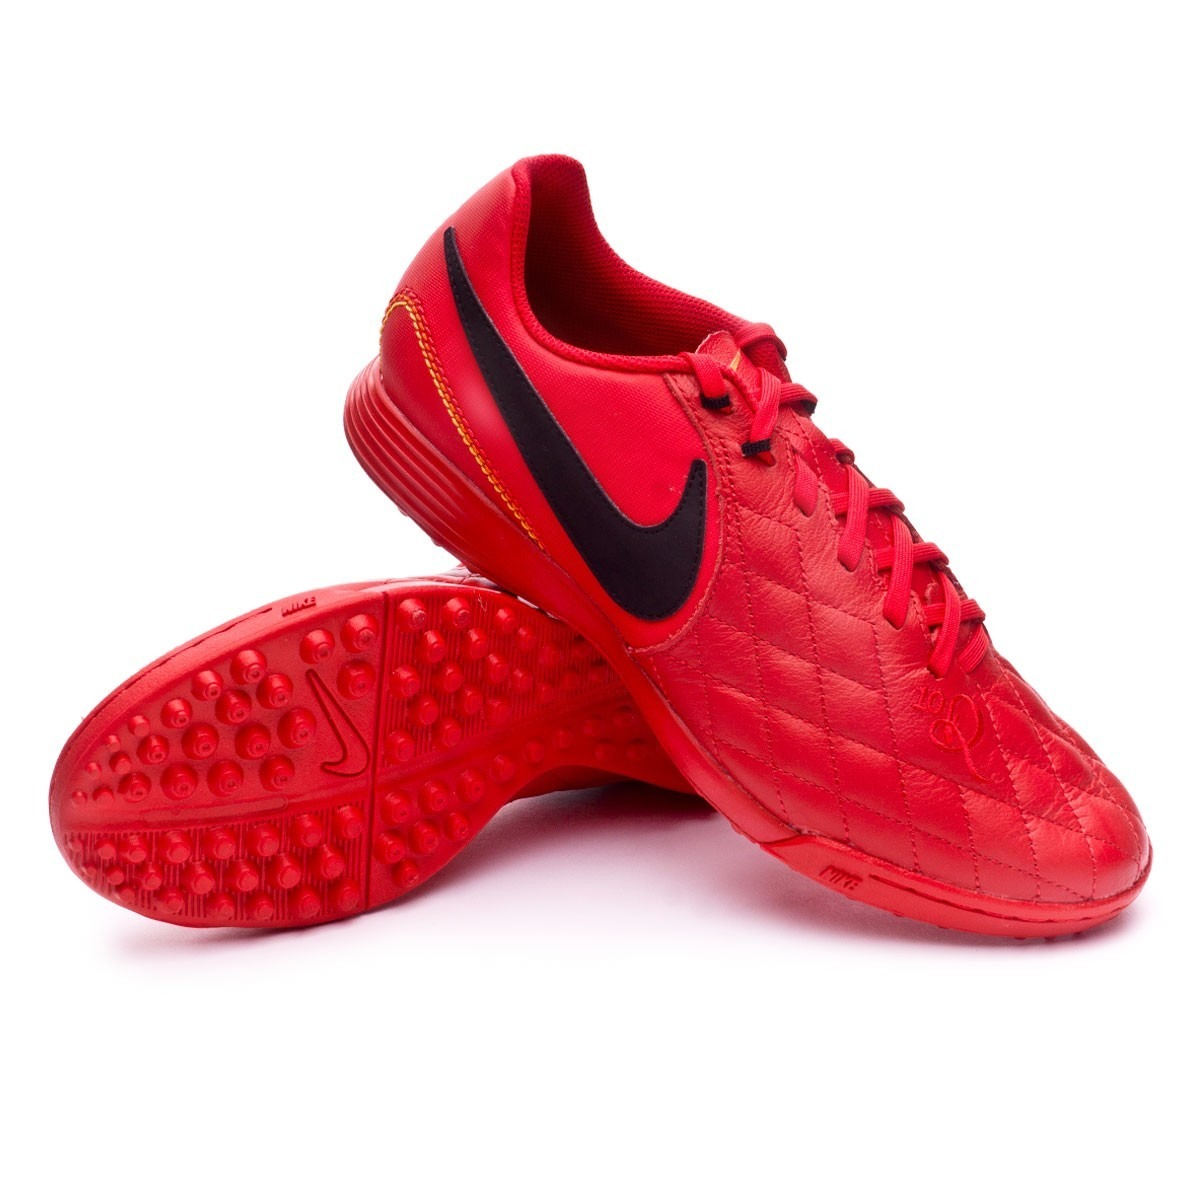 Zapatillas Nike Futbol Sintetica R10 Red 100% Original -   319.900 ... 497d2e3495de0